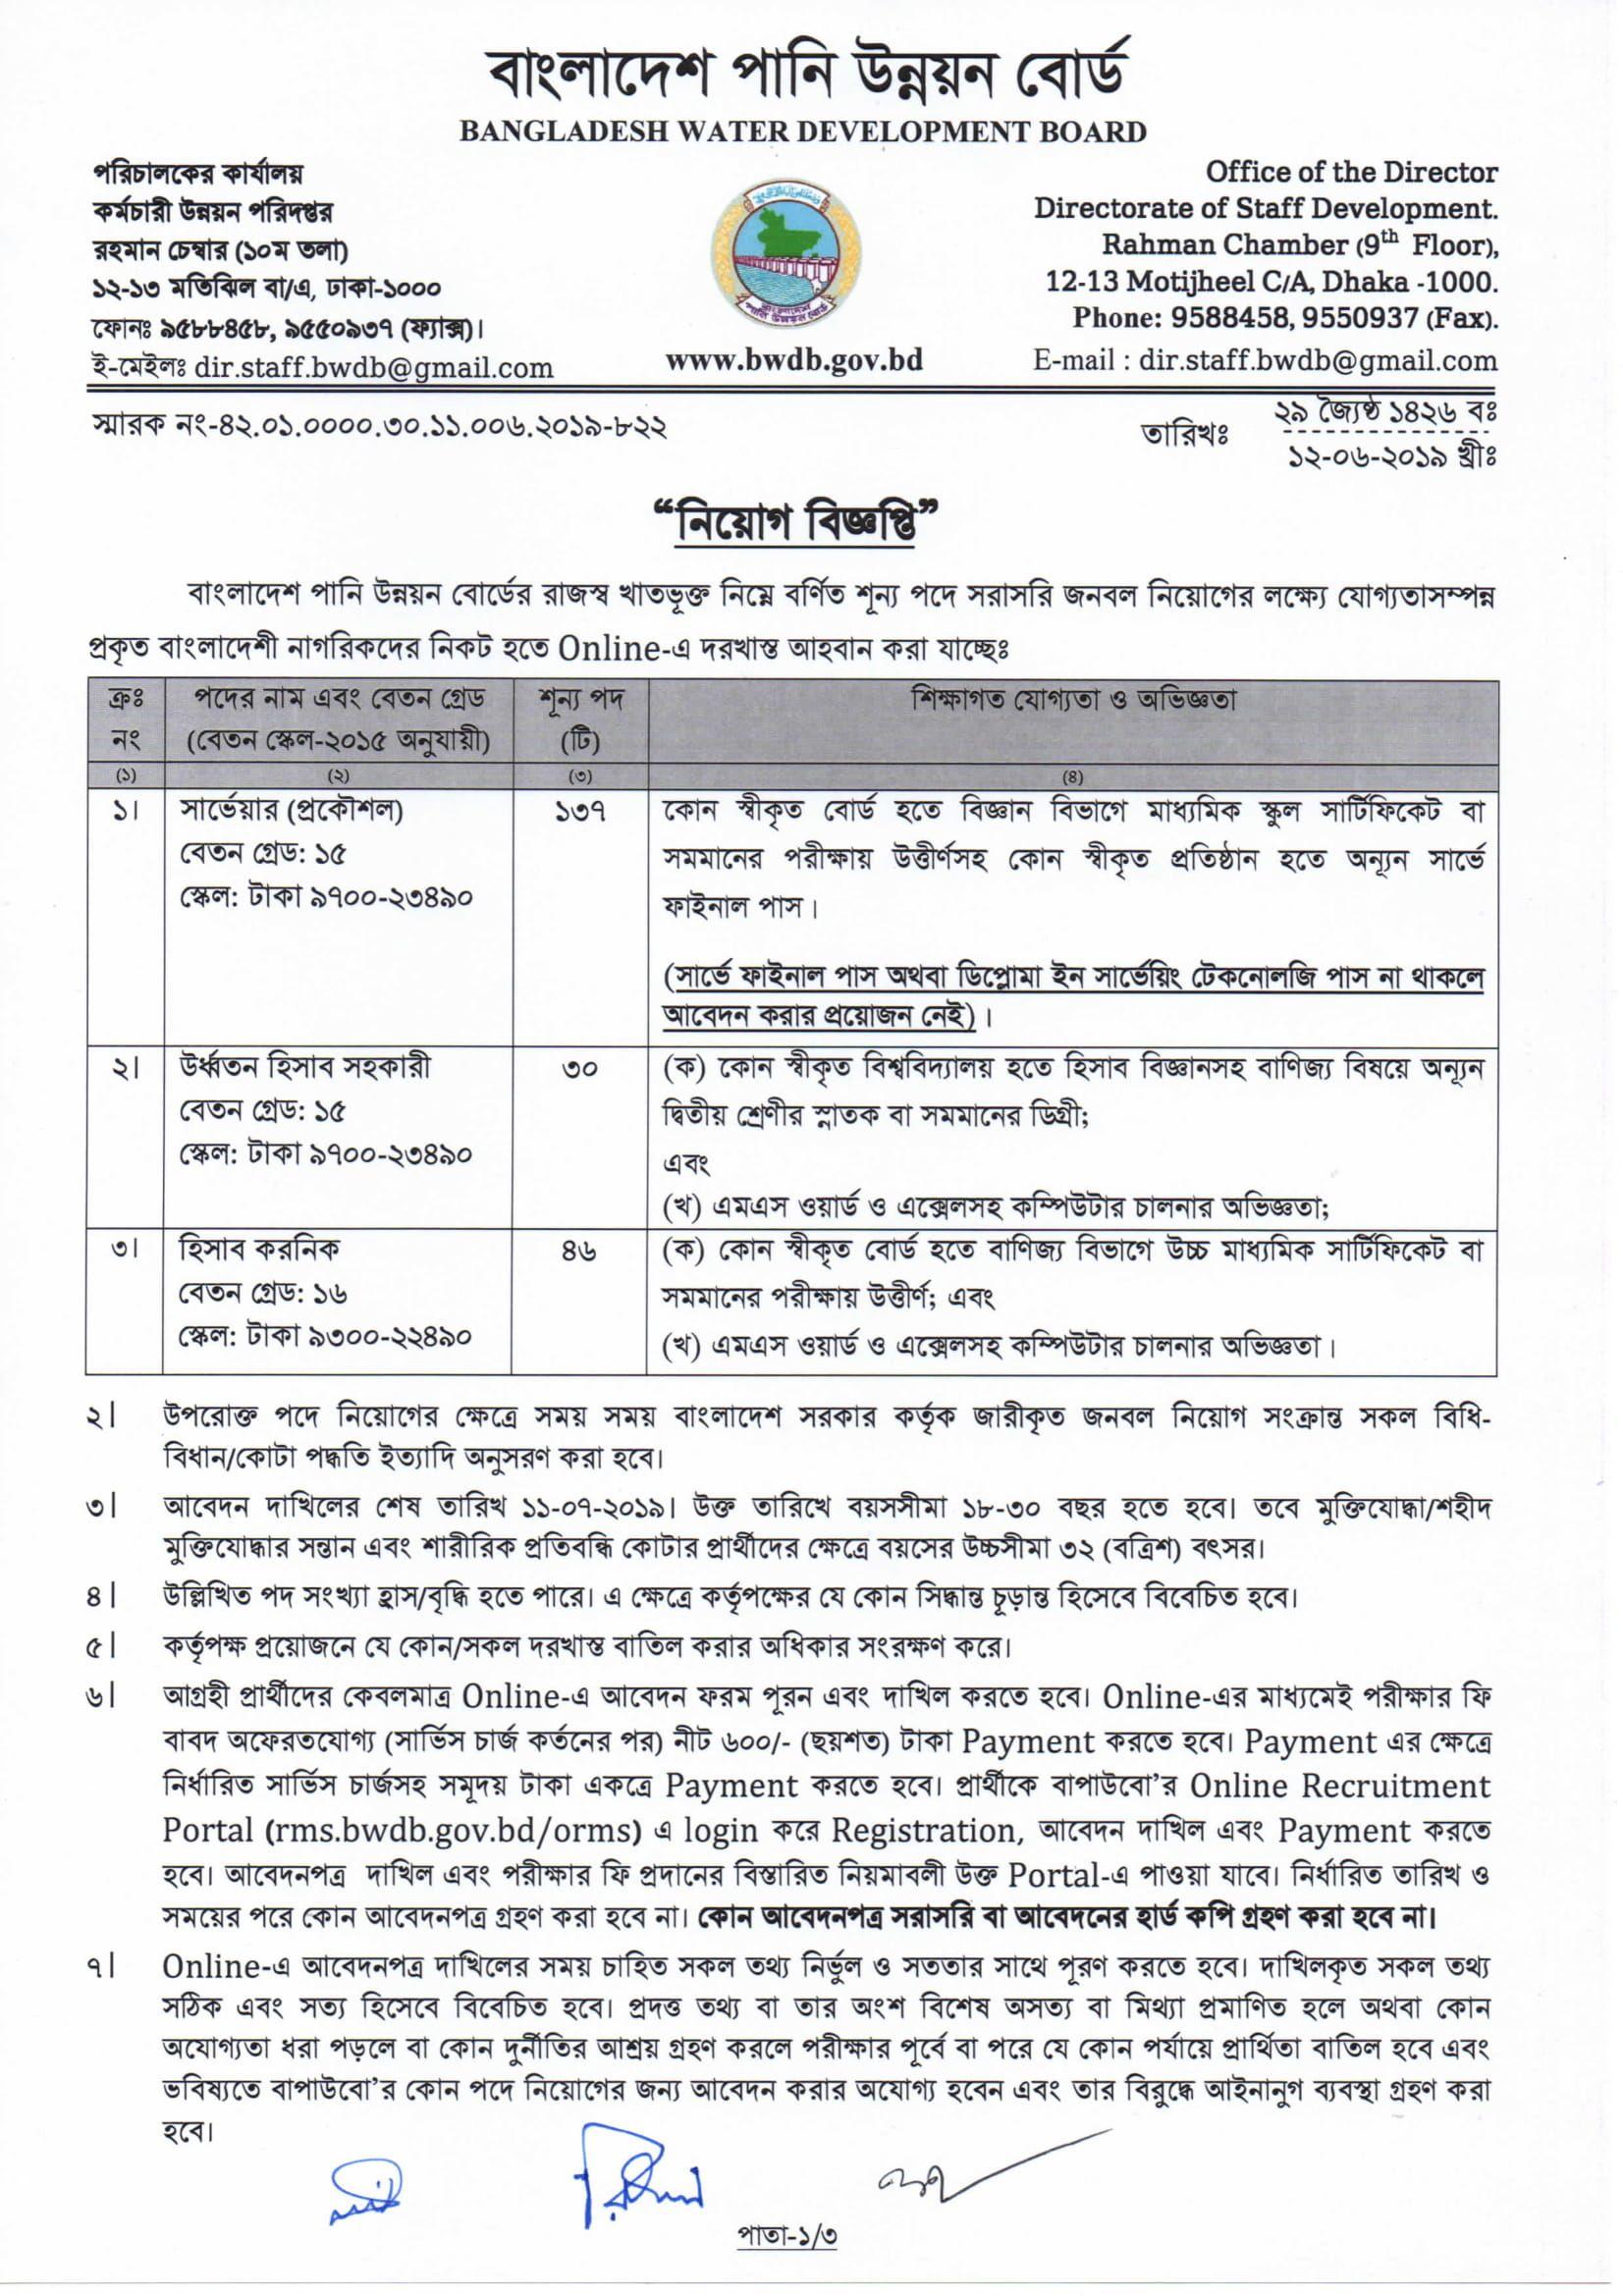 BWDB Job CIrcular 2019 | Online Apply Link - www bwdb gov bd